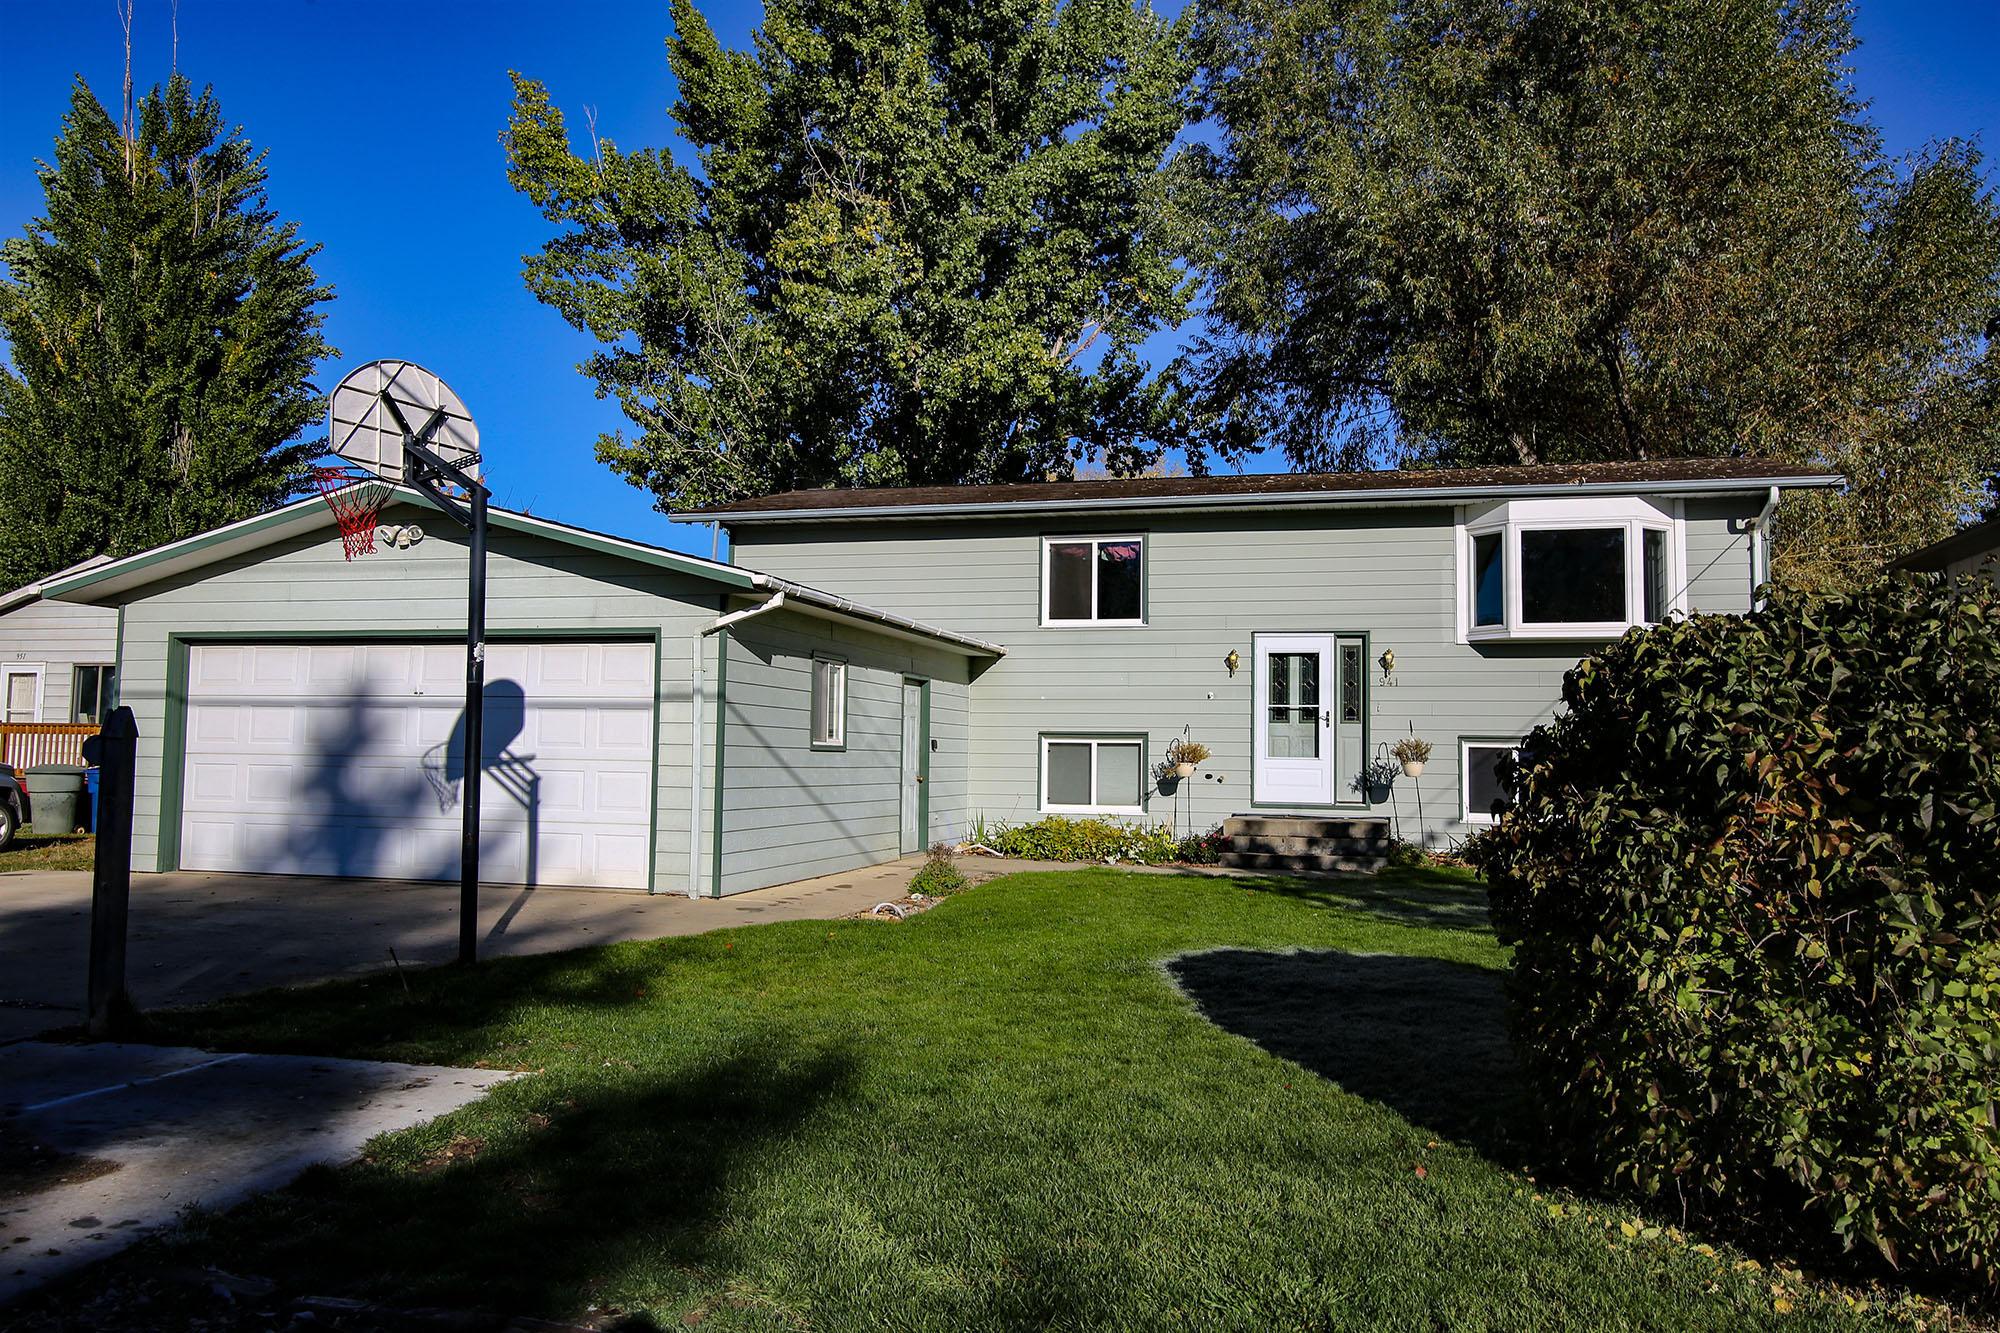 941 Leopard Street, Sheridan, Wyoming 82801, 5 Bedrooms Bedrooms, ,2 BathroomsBathrooms,Residential,For Sale,Leopard,18-1109